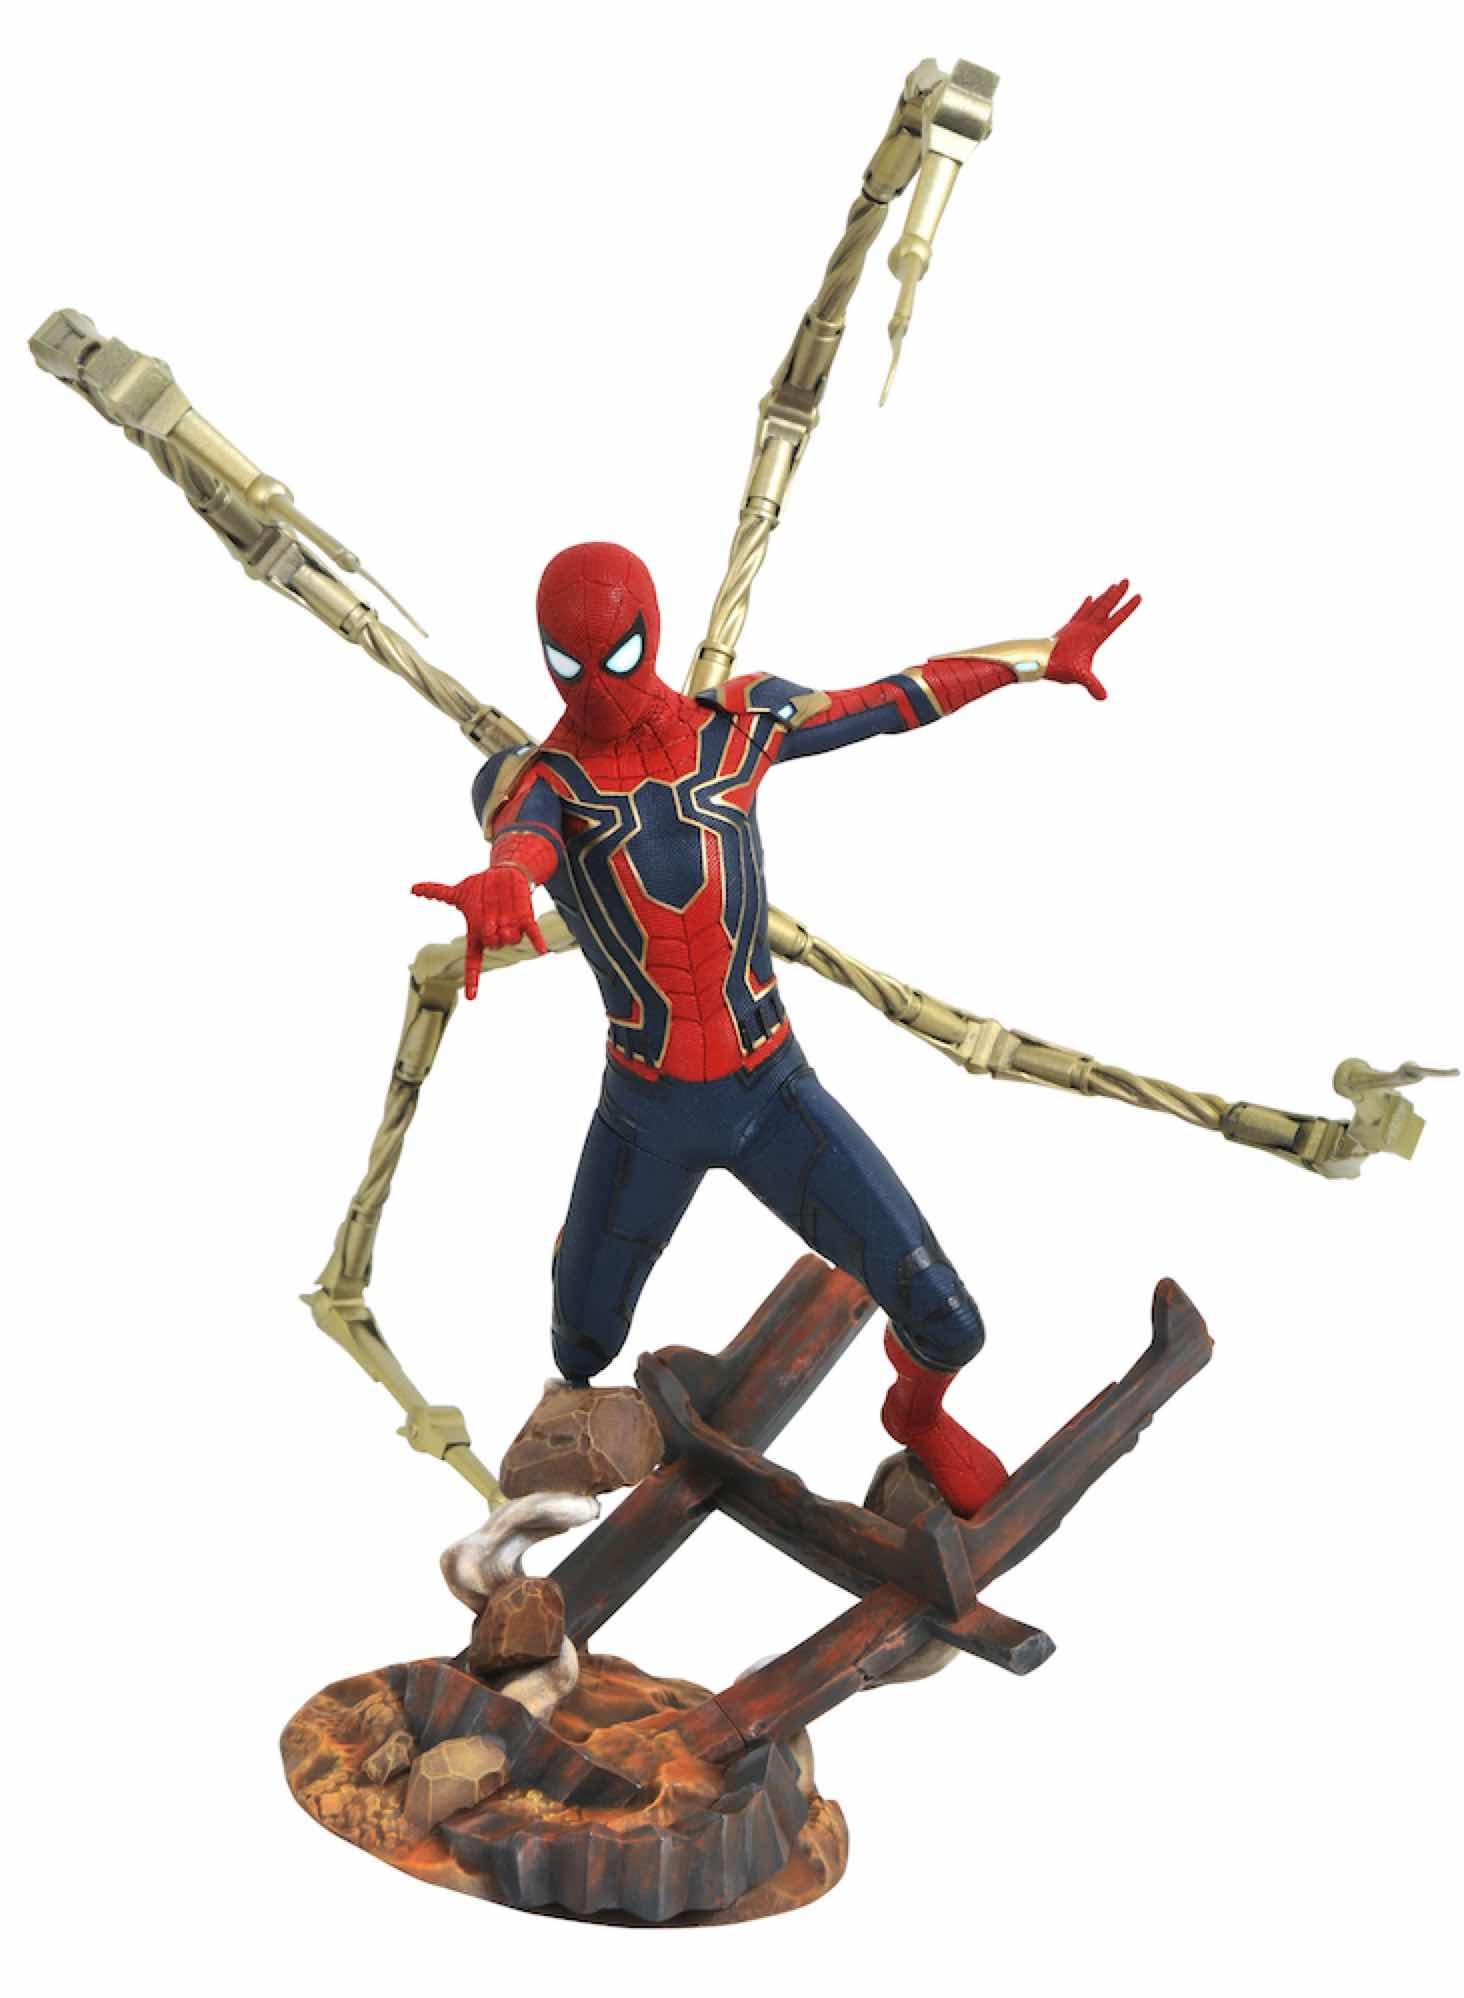 IRON SPIDER-MAN ESTATUA RESINA MARVEL PREMIER COLLECTION AVENGERS 3